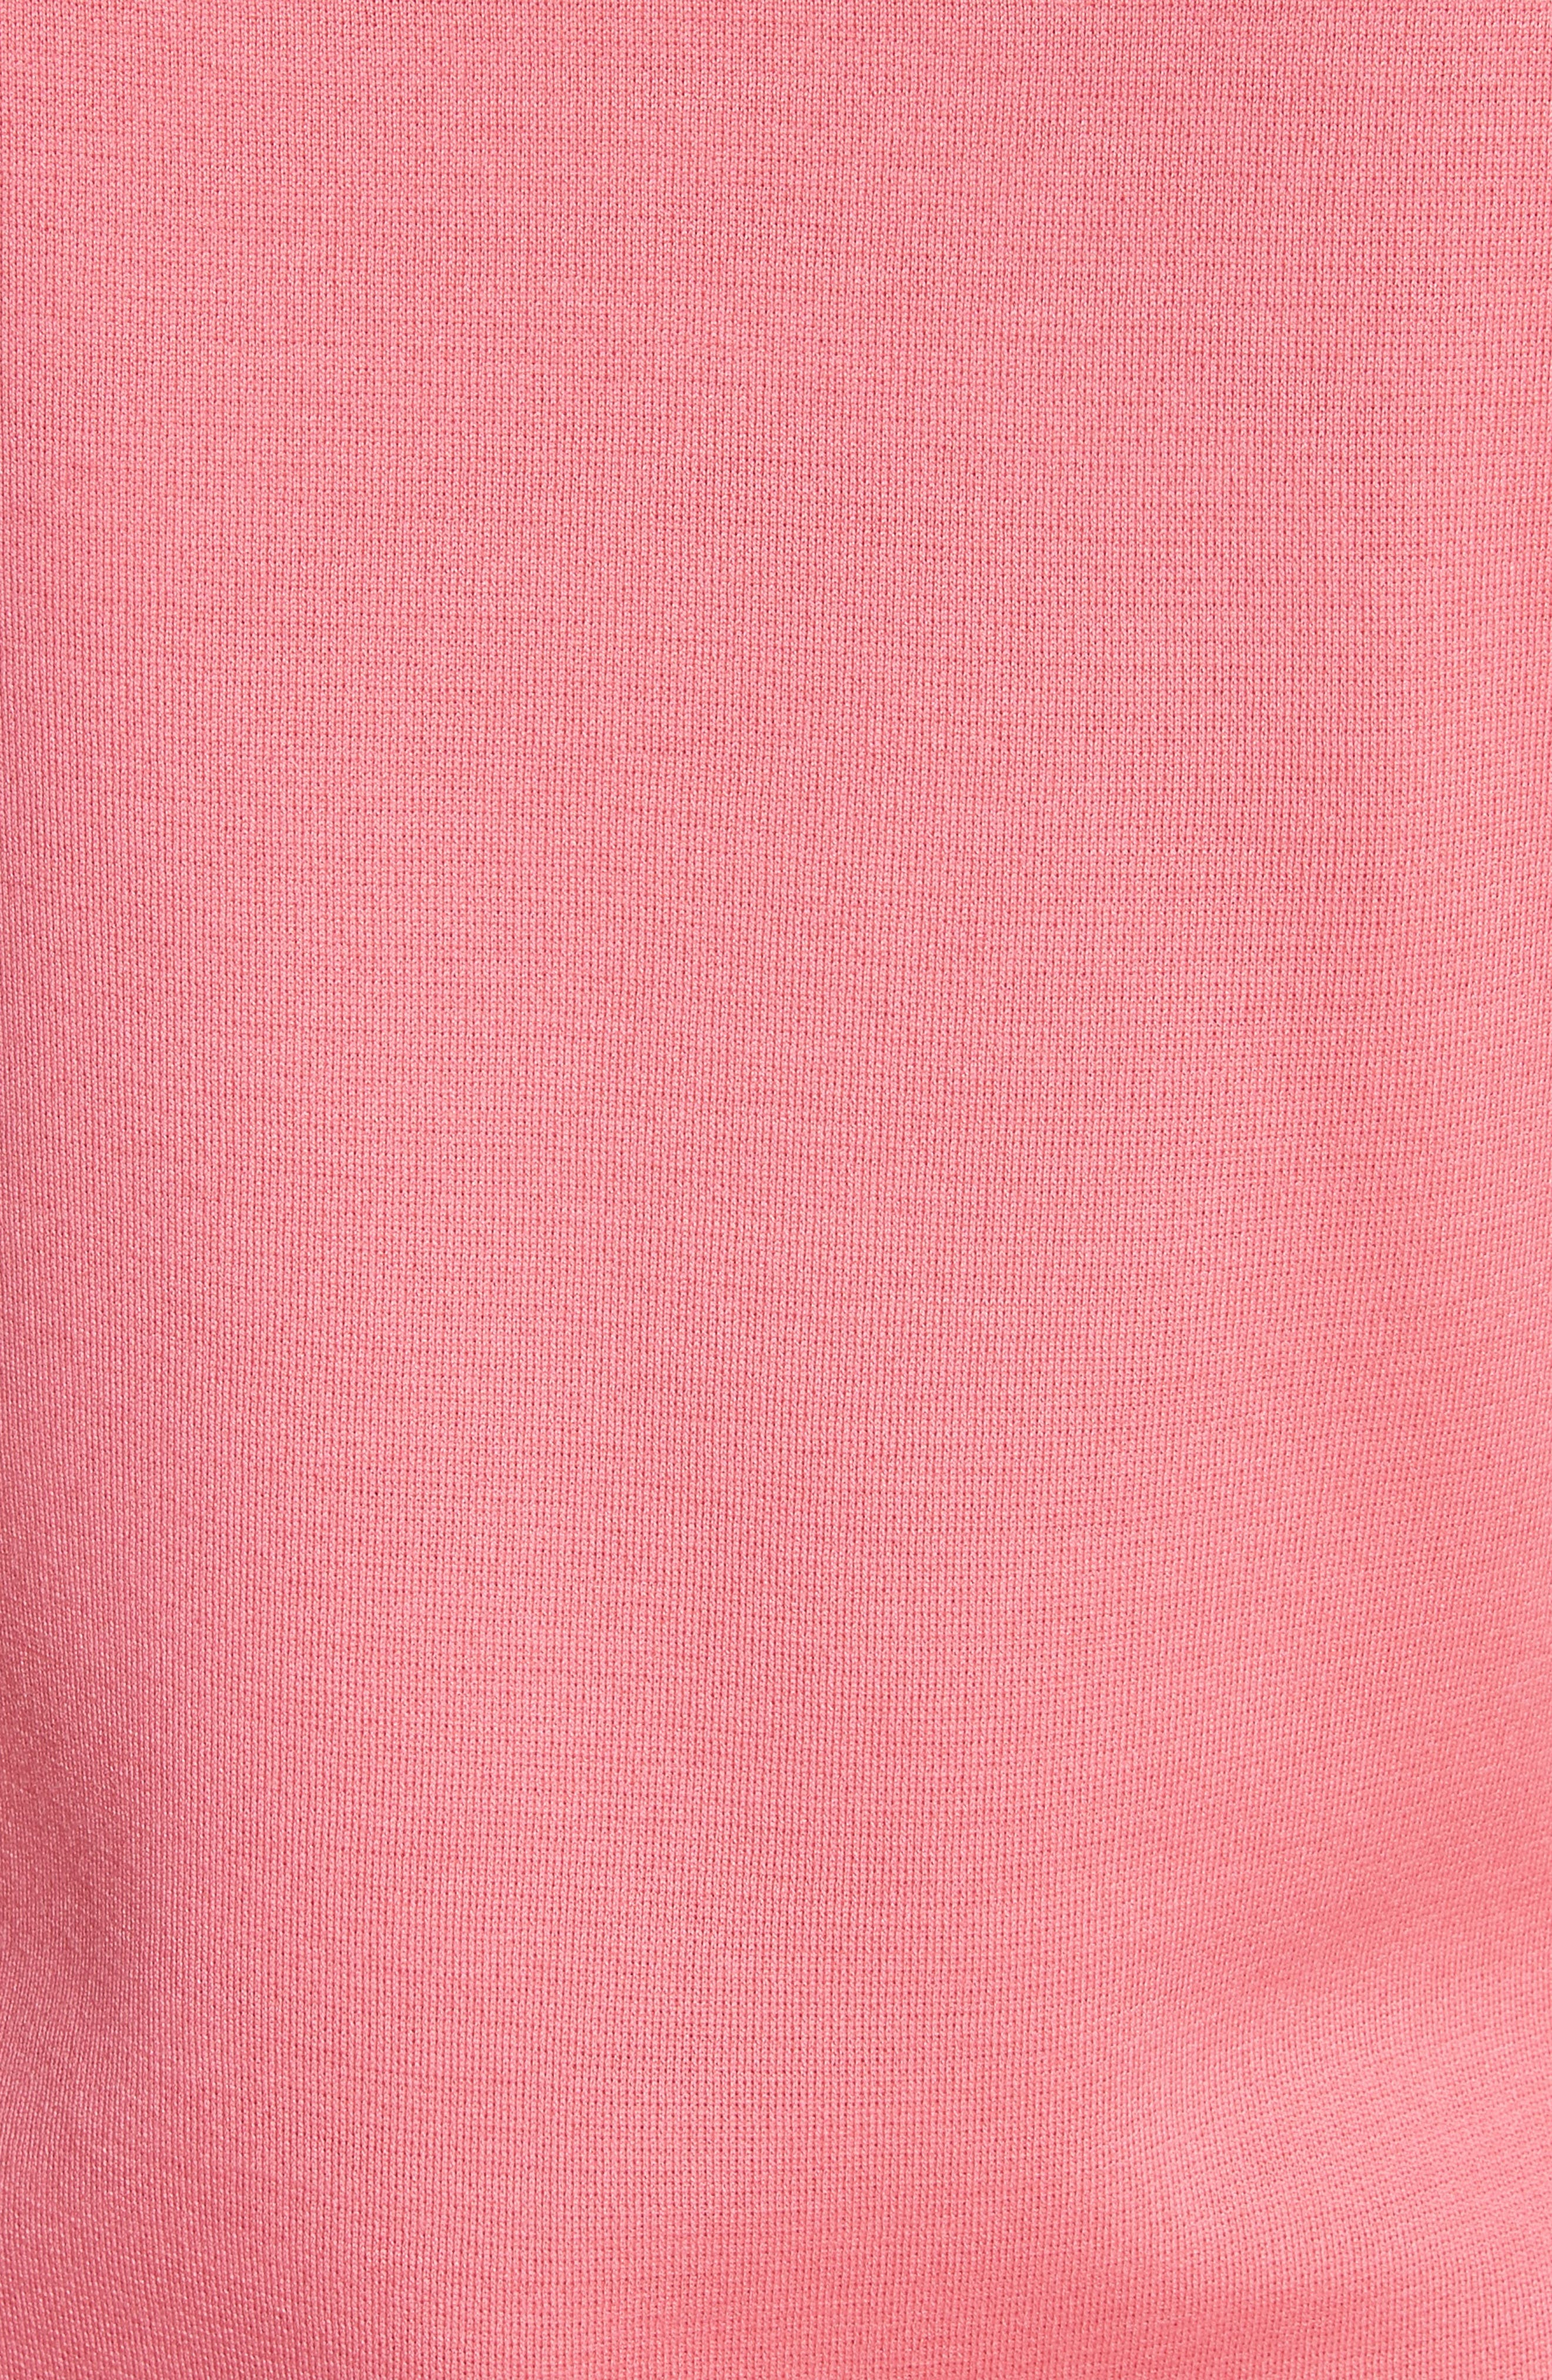 Milano Knit Contour Shell,                             Alternate thumbnail 5, color,                             660